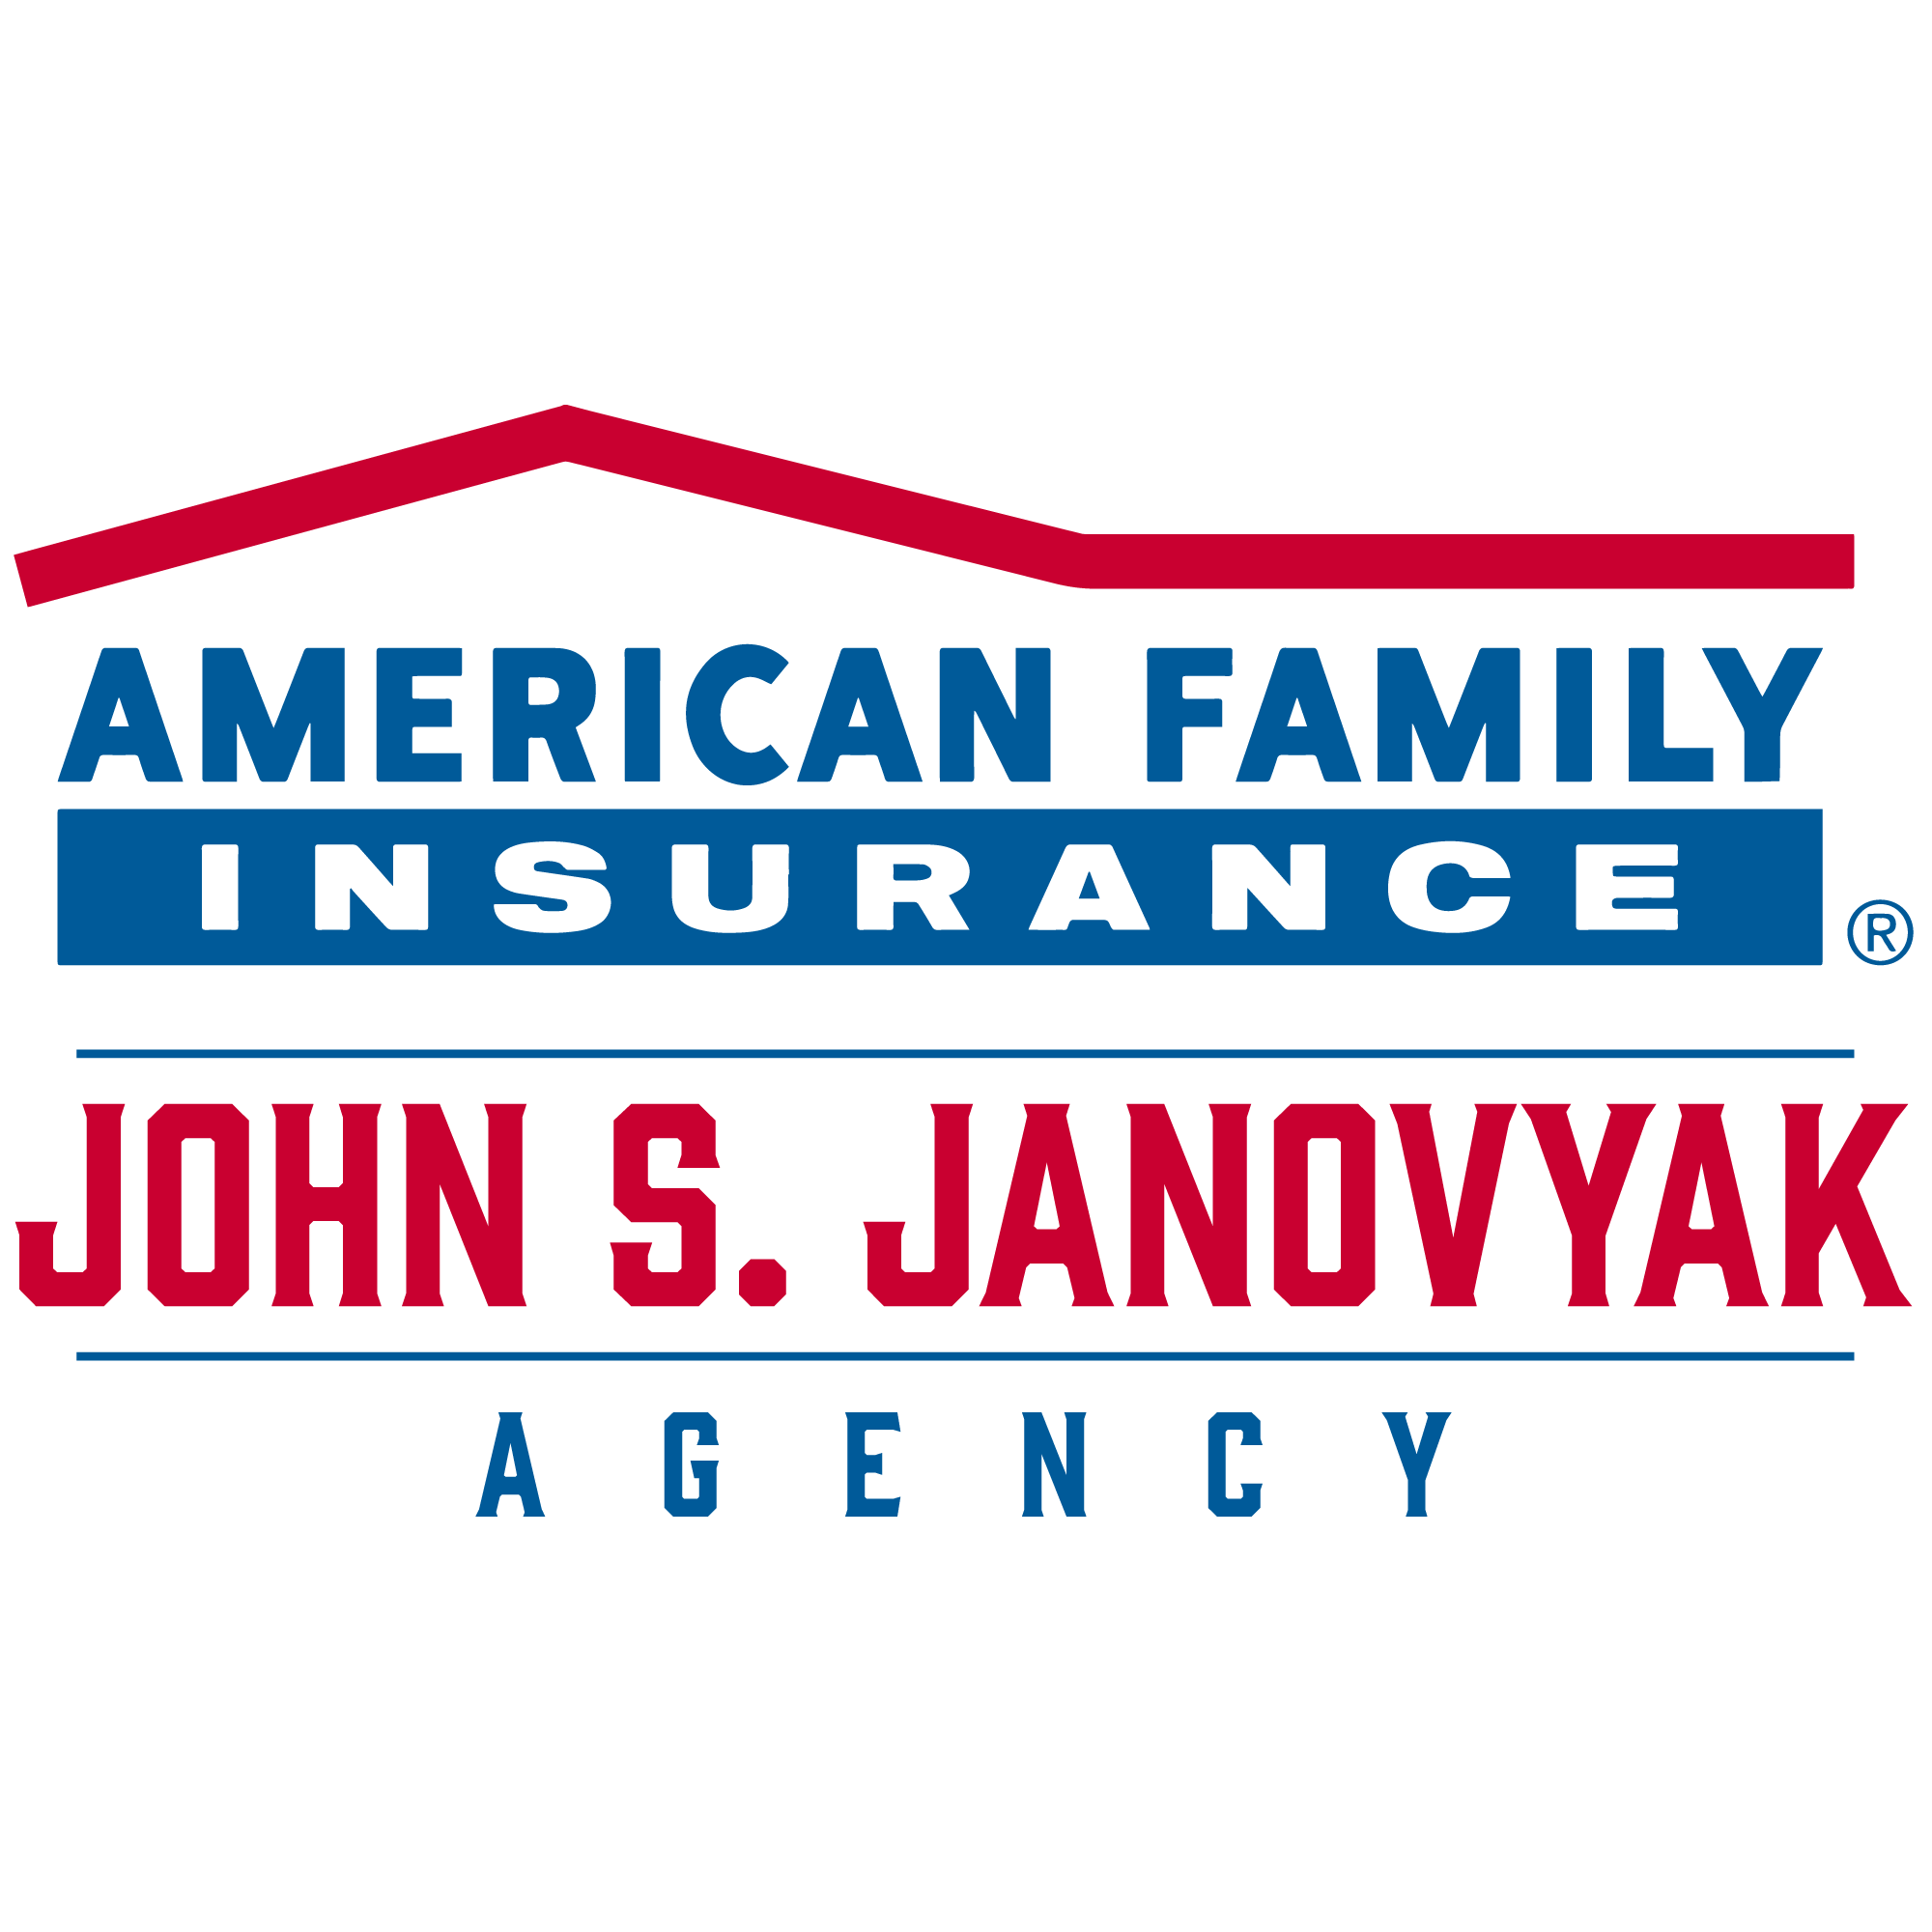 American Family Insurance - John S Janovyak Agency Inc